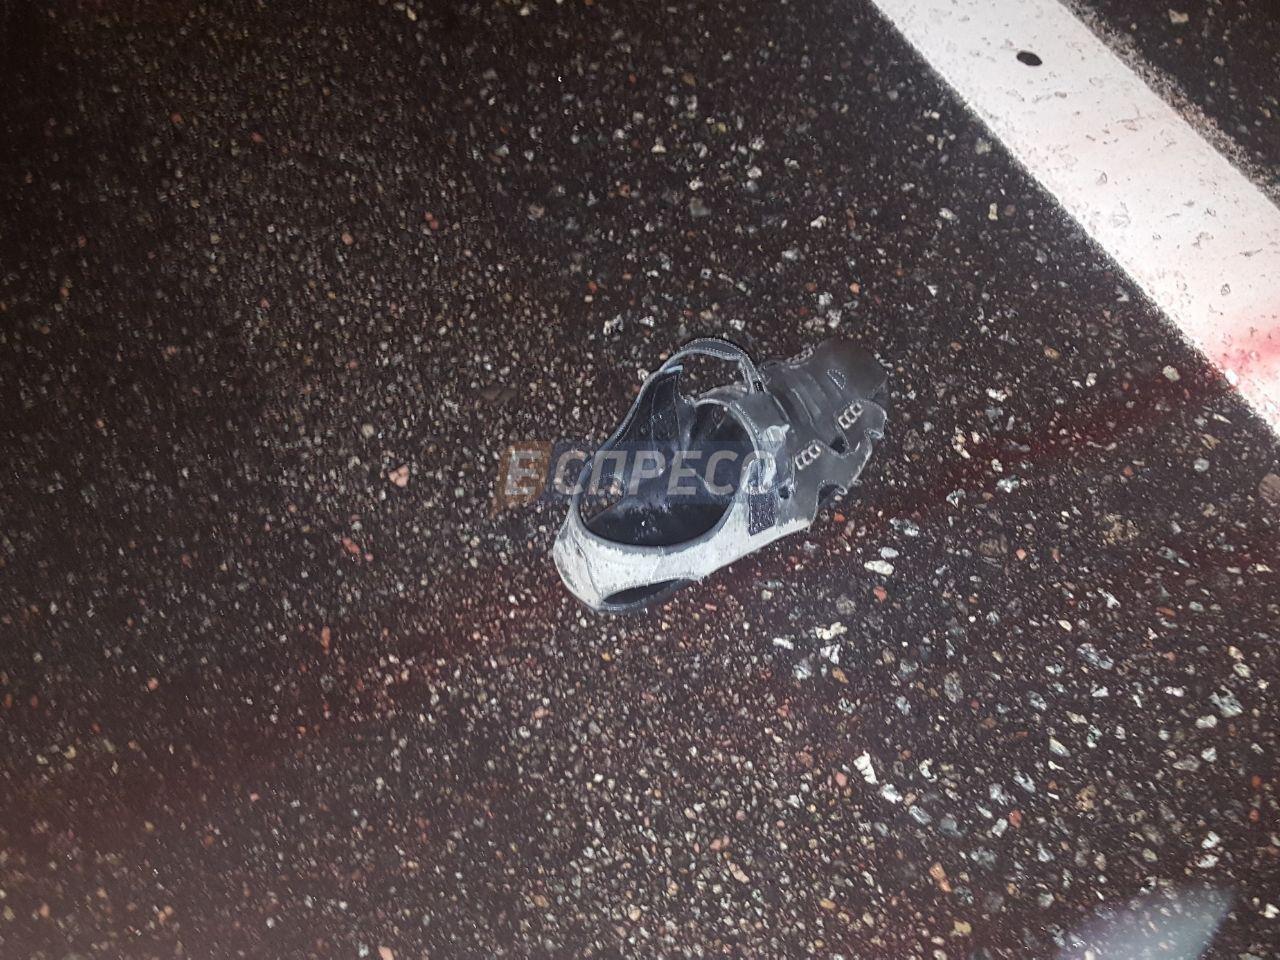 ВКиеве шофёр иномарки сбил водителя троллейбуса